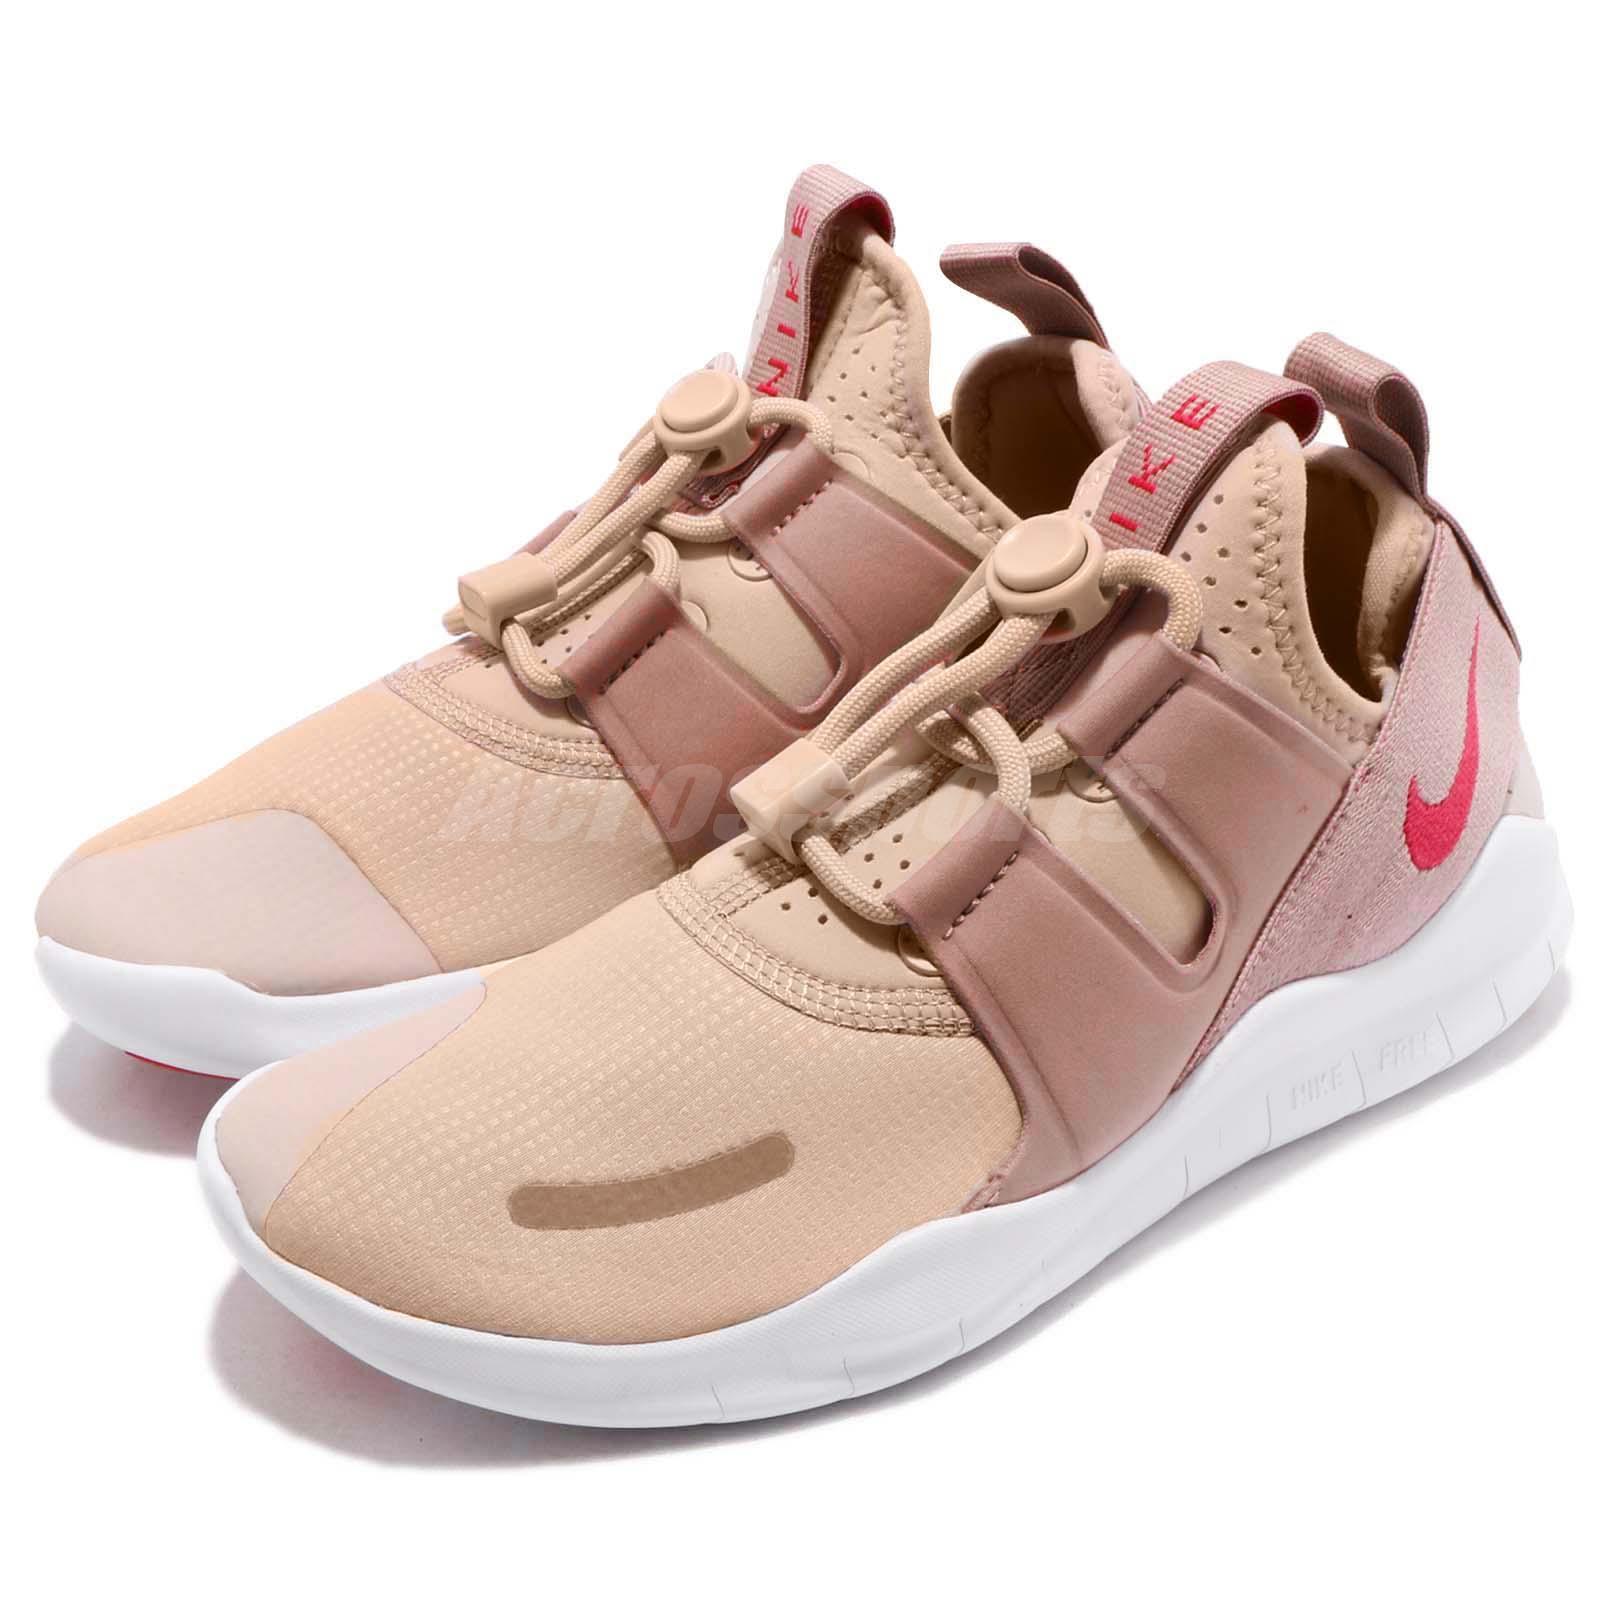 Chaussures Rmc Femme Nike Féminin Beige 2018 De Libre dwY6x6O5q